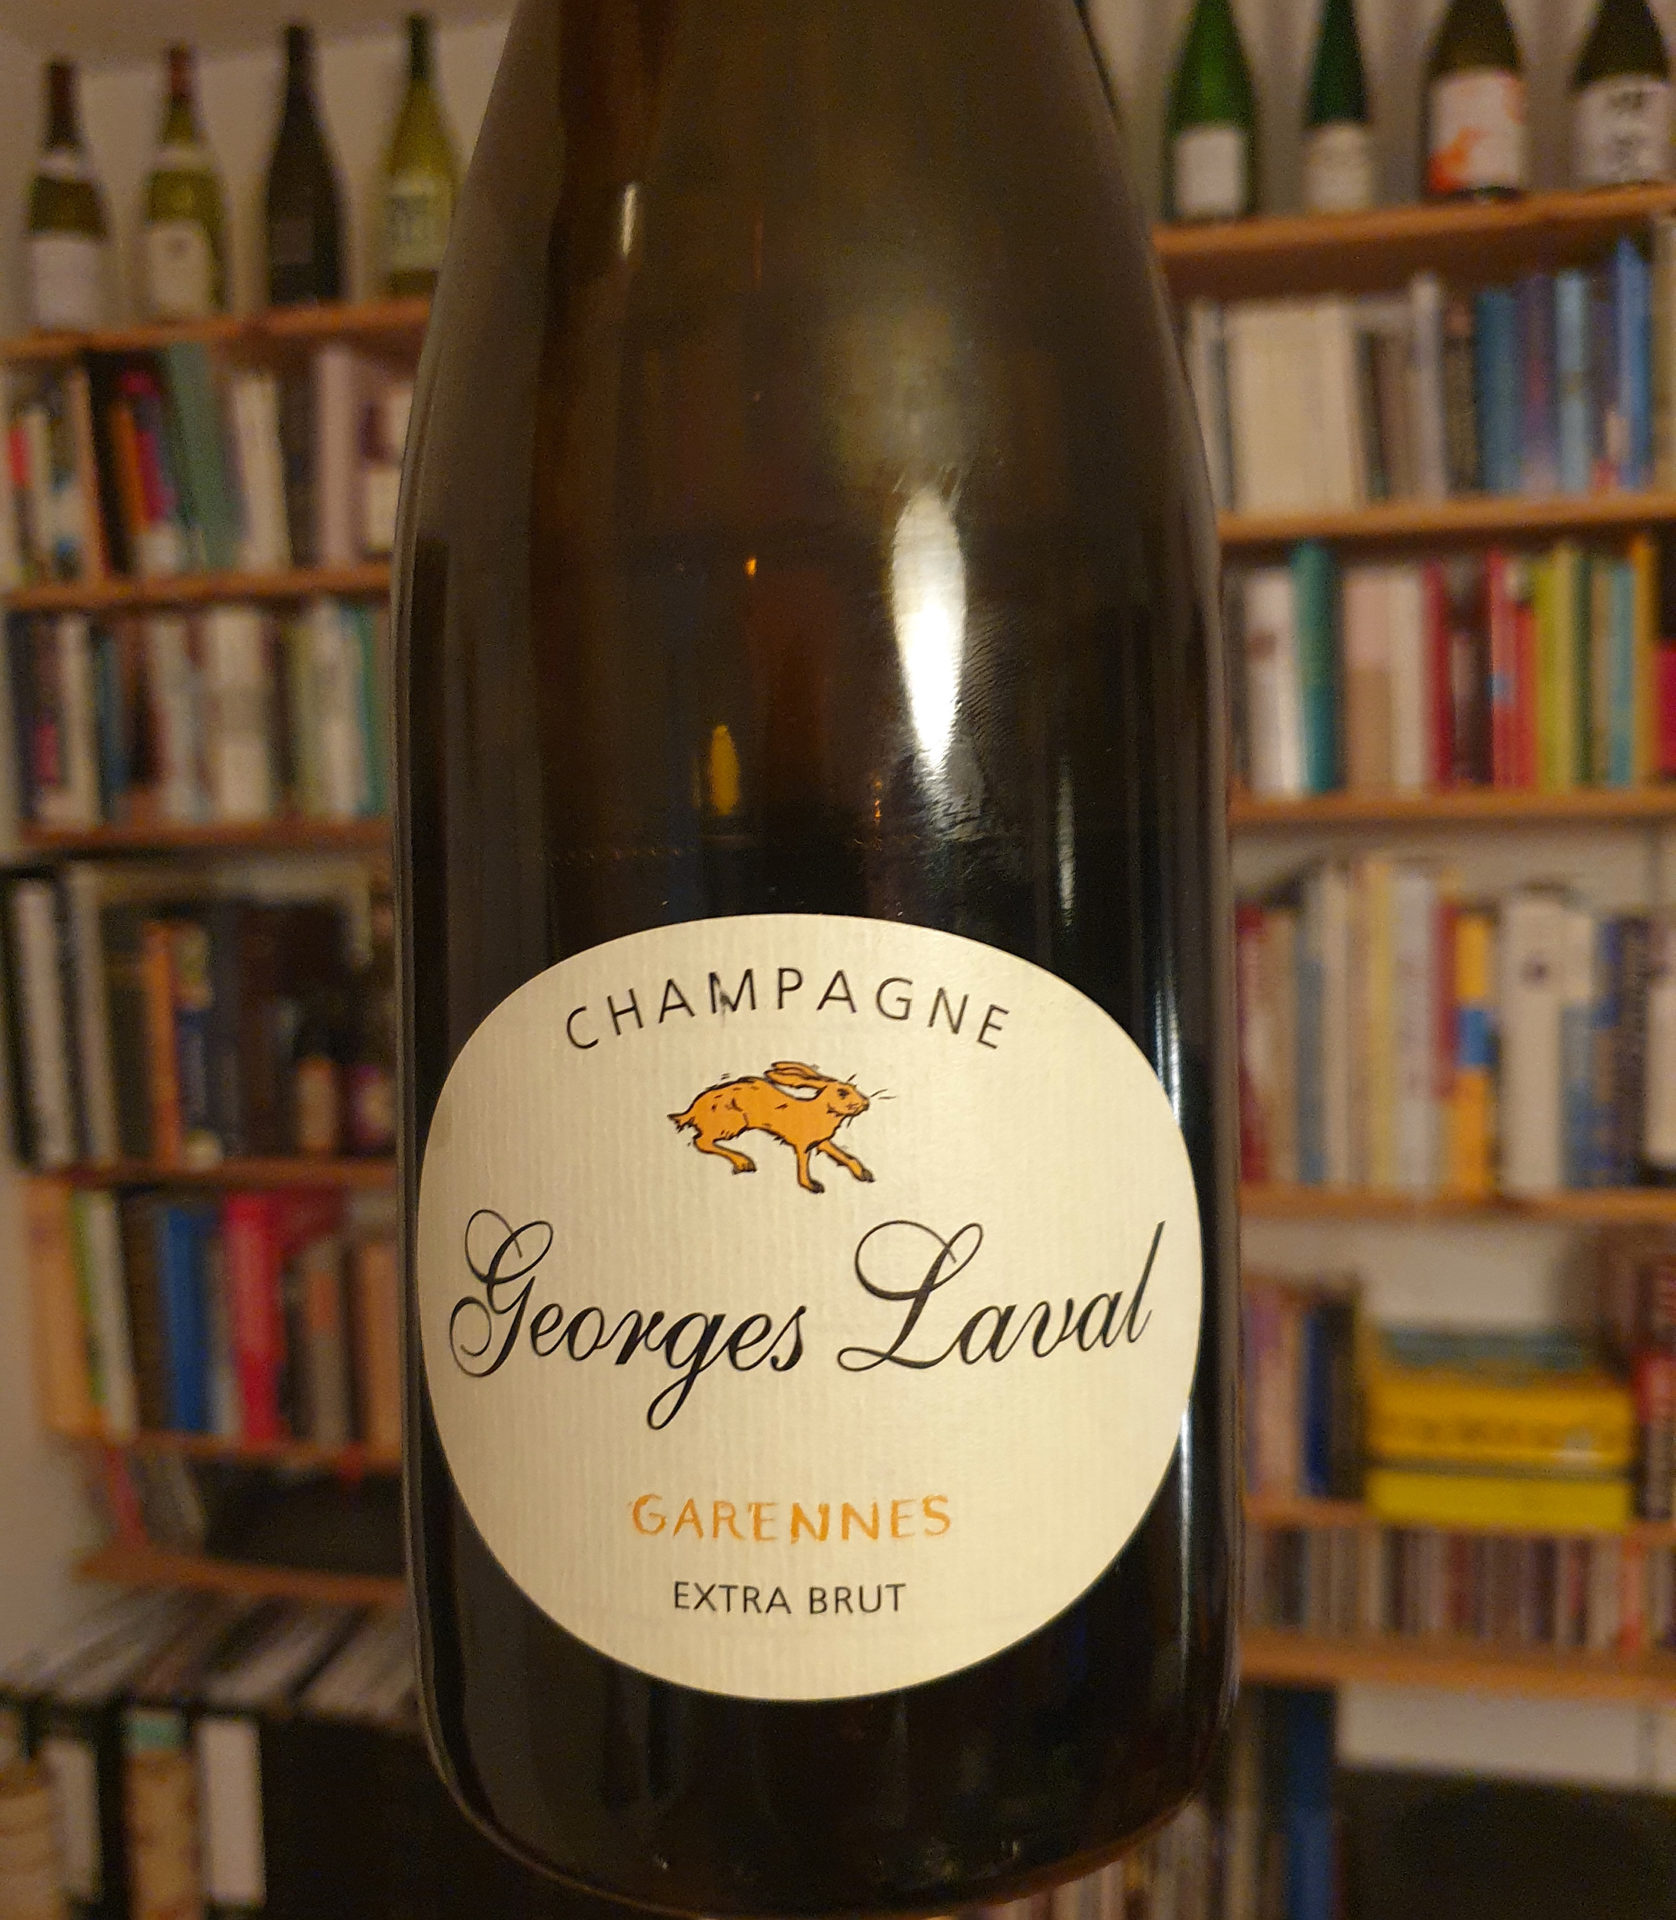 Georges Laval – Garennes Extra Brut